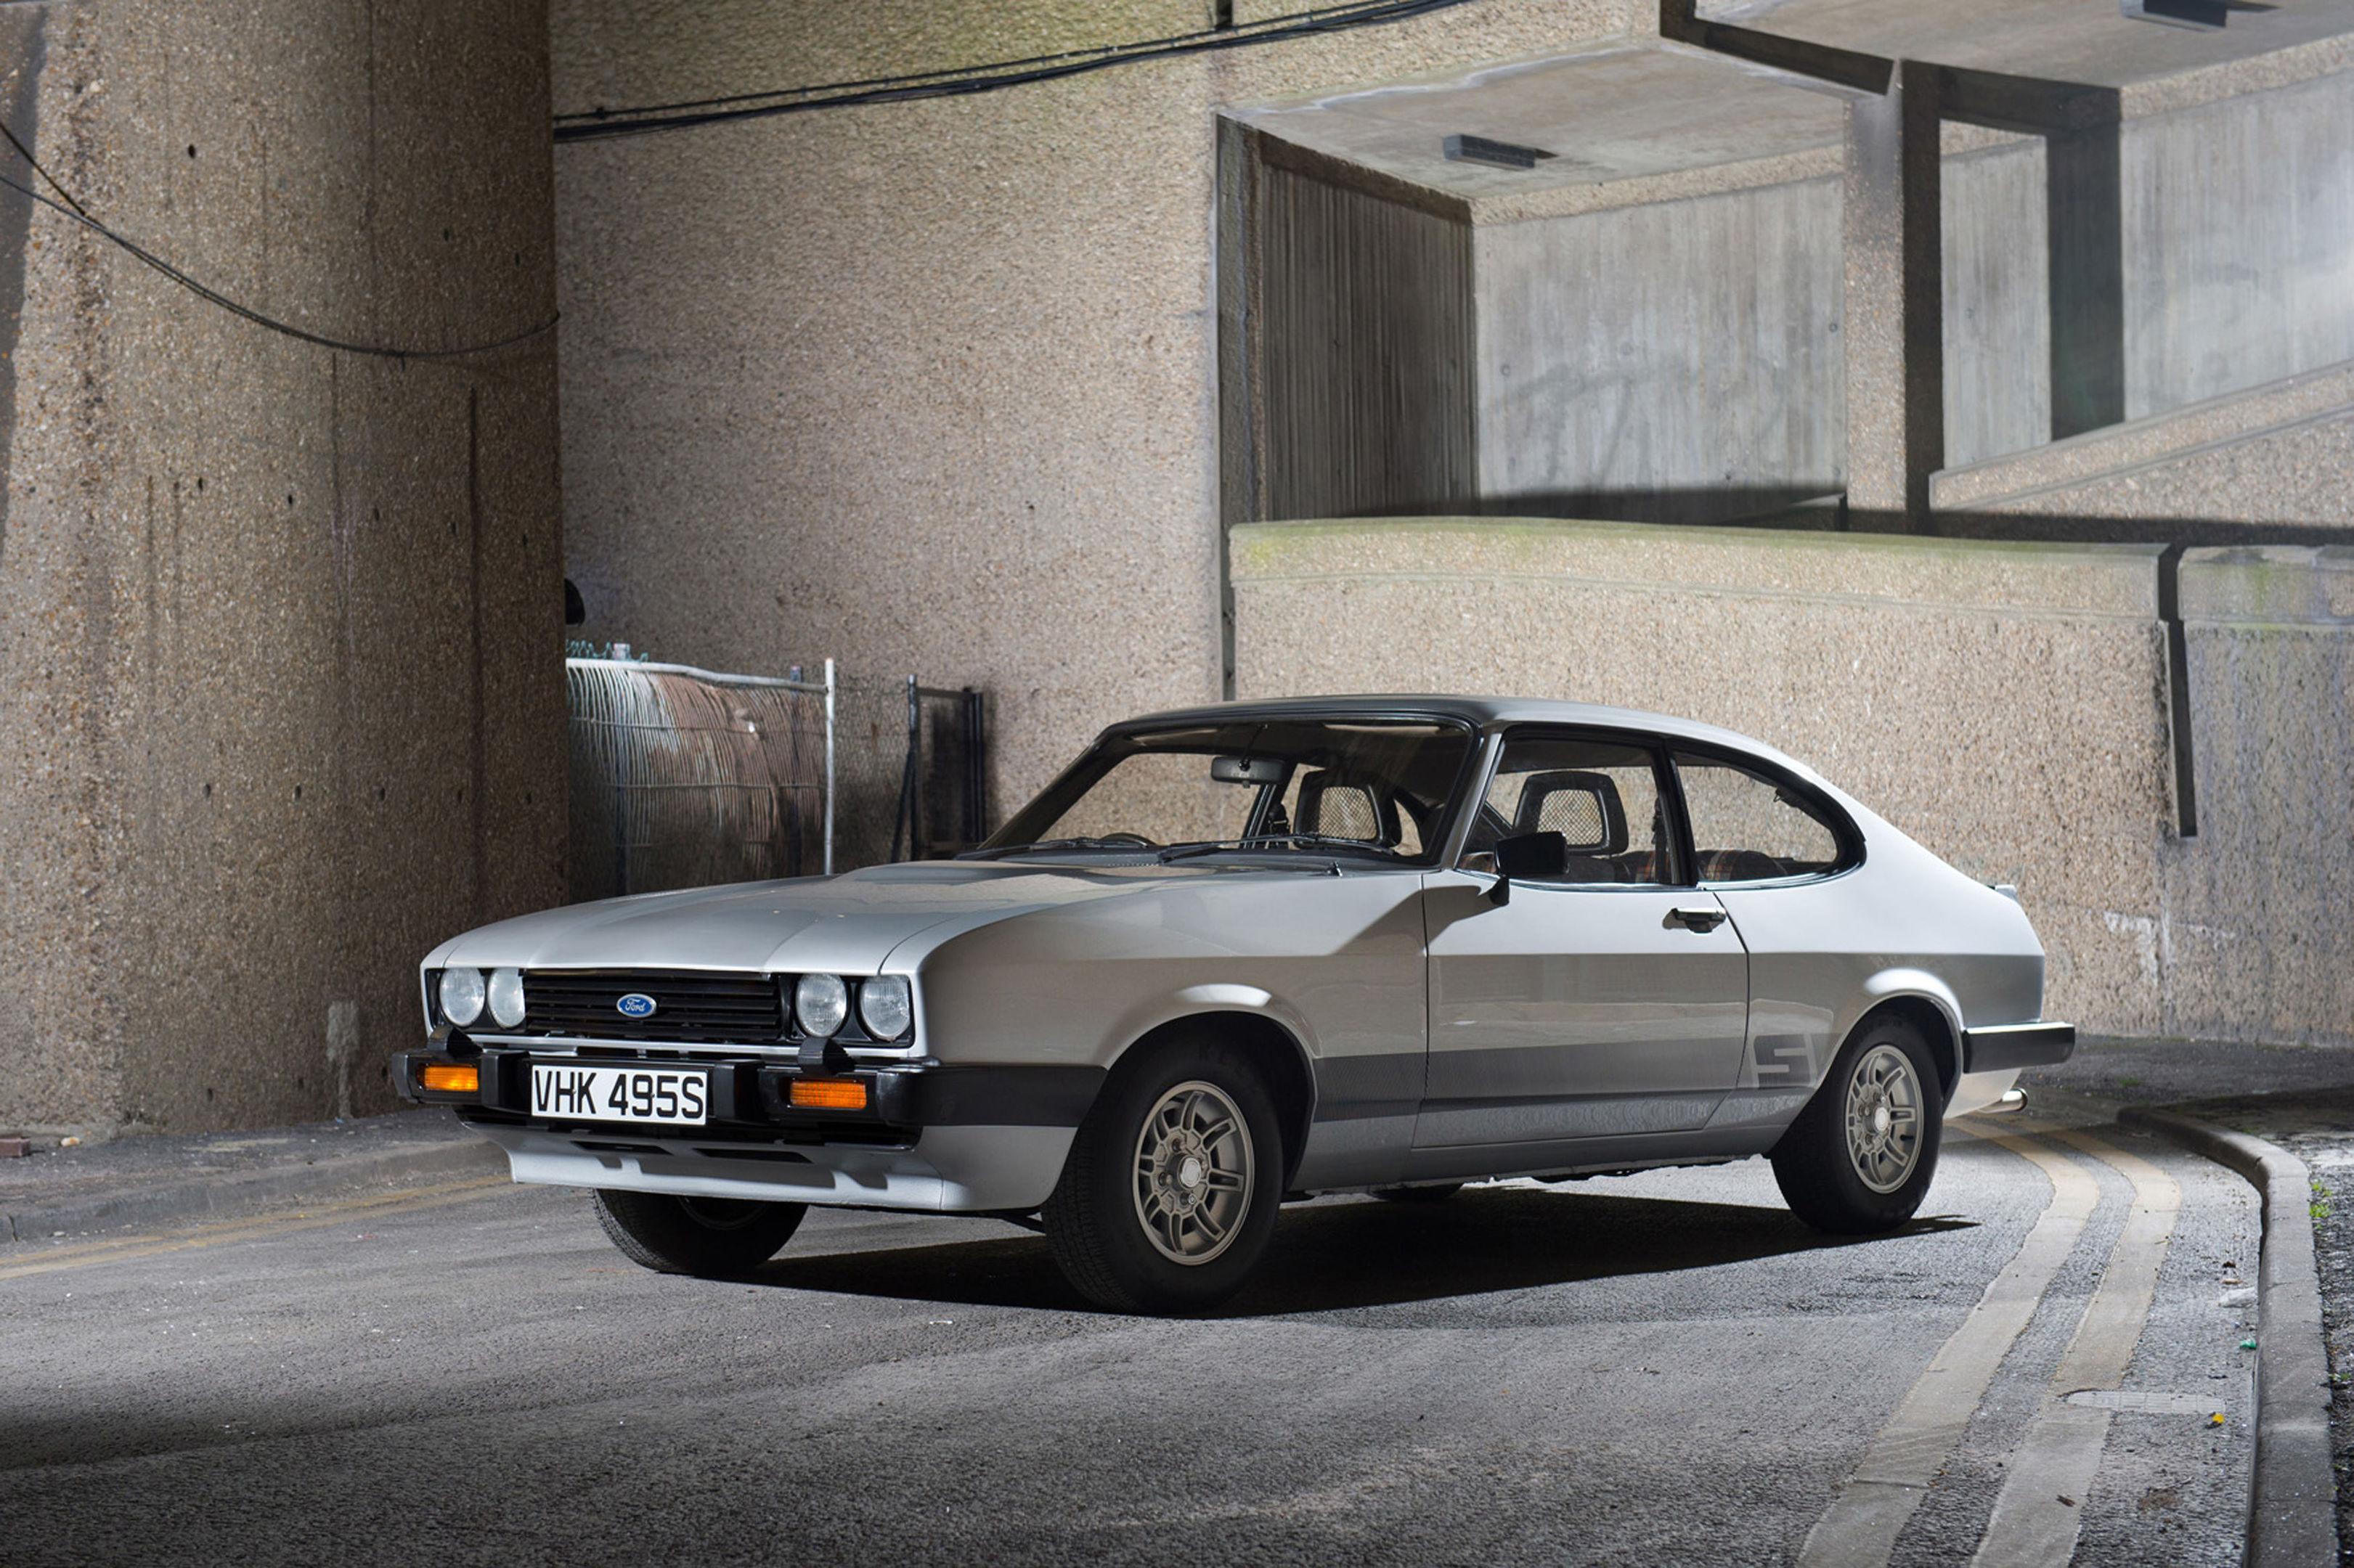 The 1978 Ford Capri.